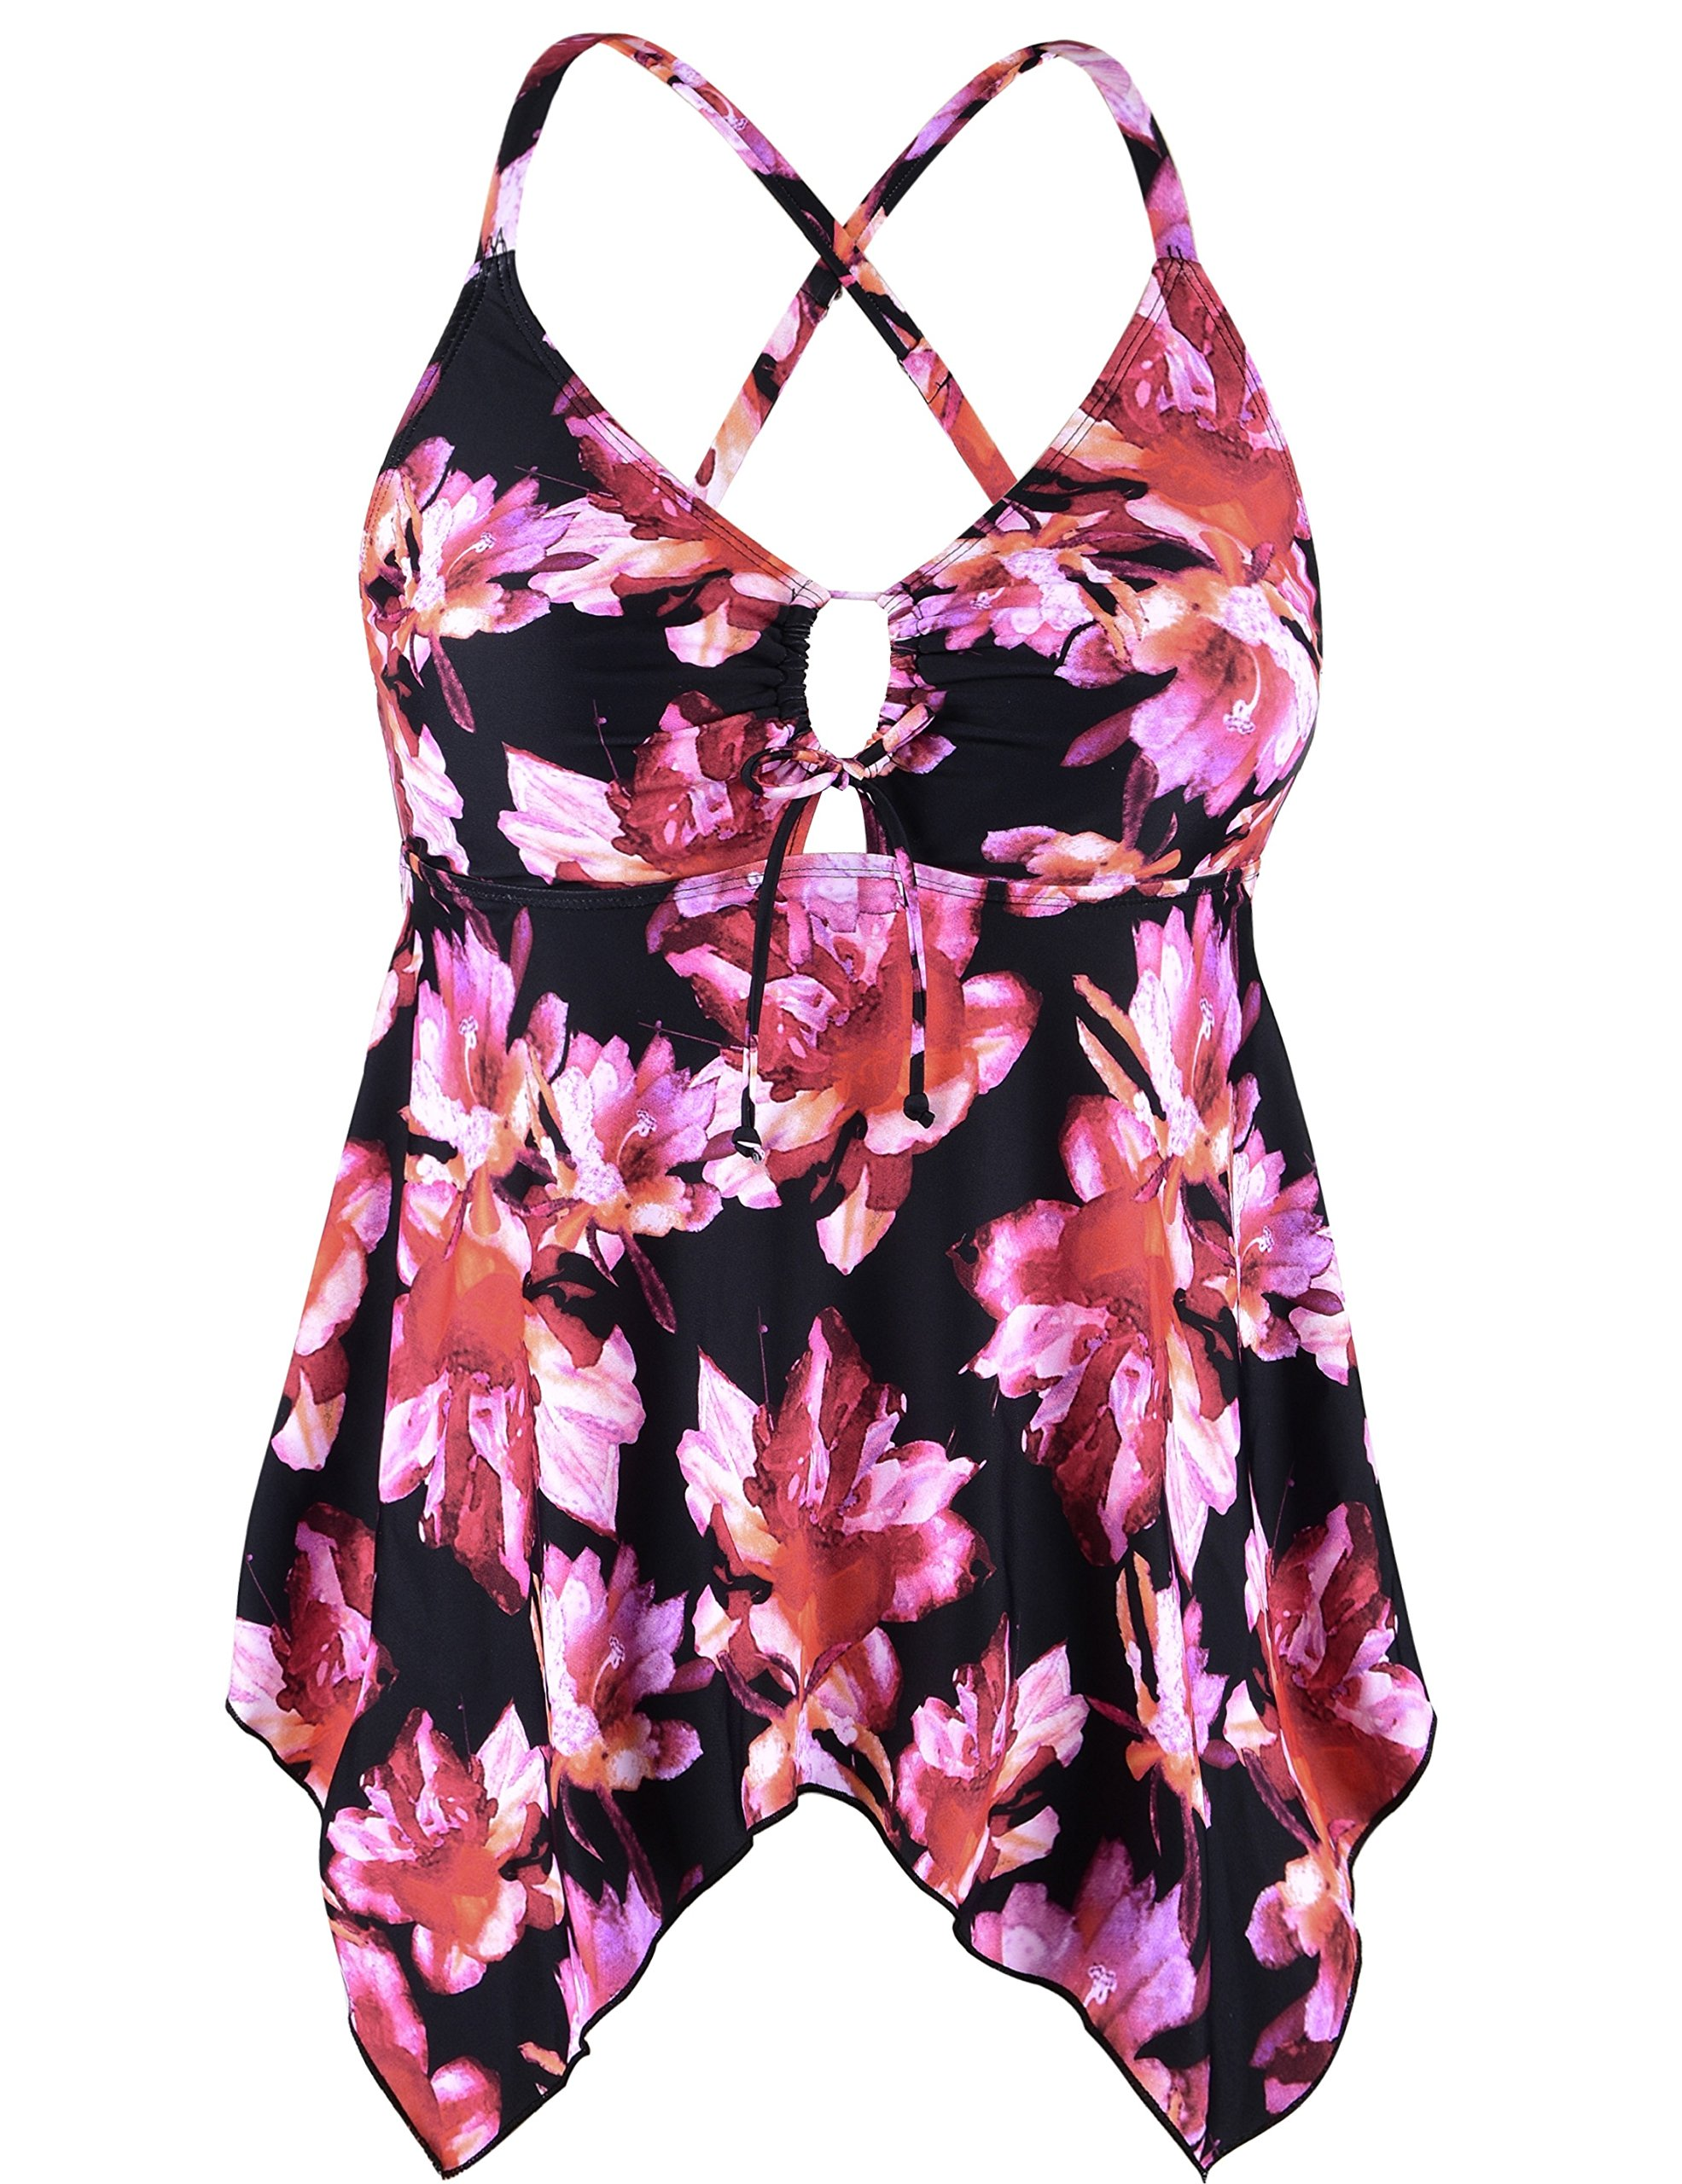 f8fd061b165 Galleon - Firpearl Women s Black Flowy Swimsuit Crossback Plus Size Tankini  Top US12 Pink Floral